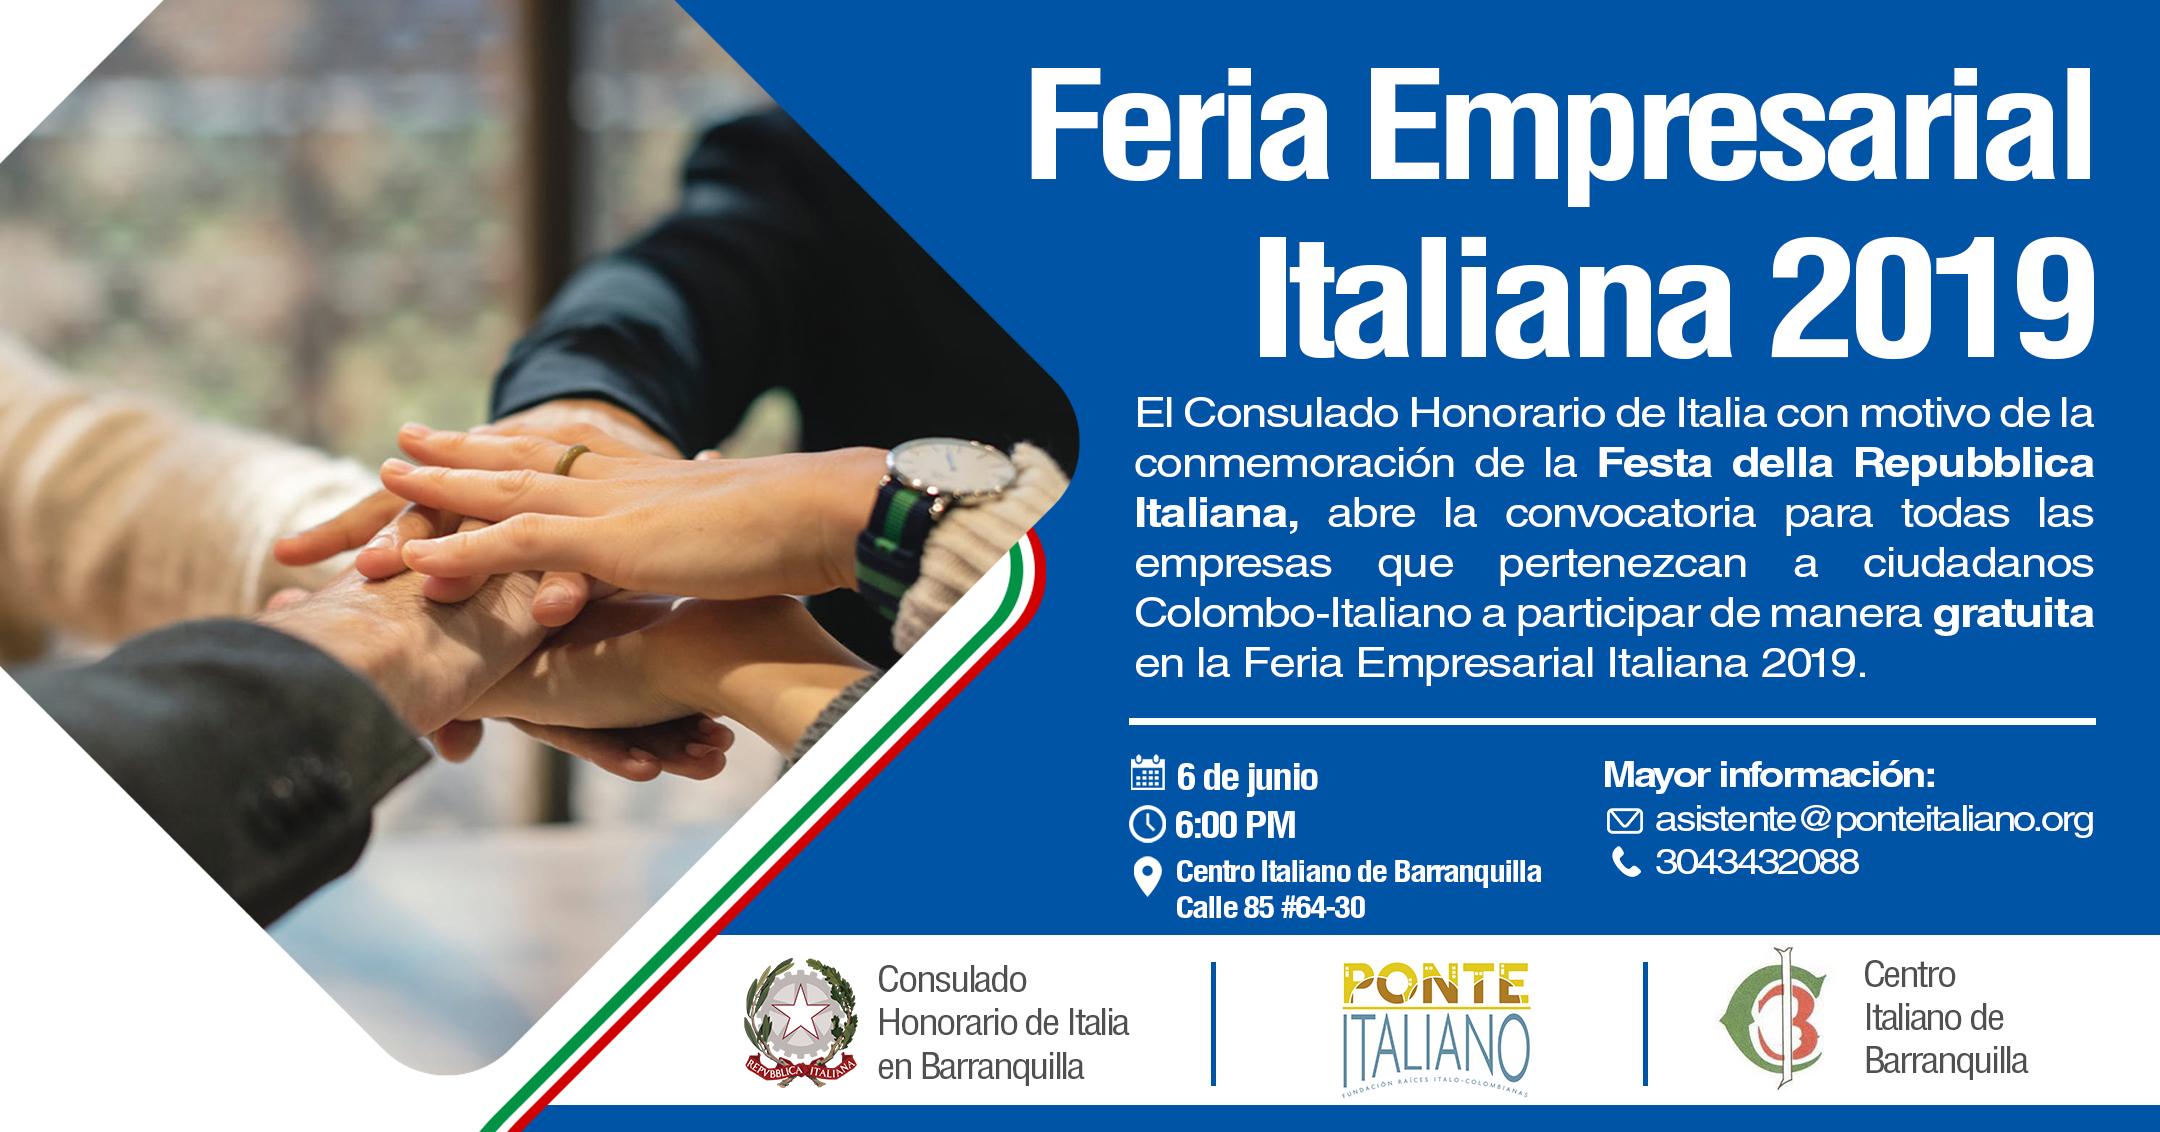 Feria Empresarial Italiana 2019